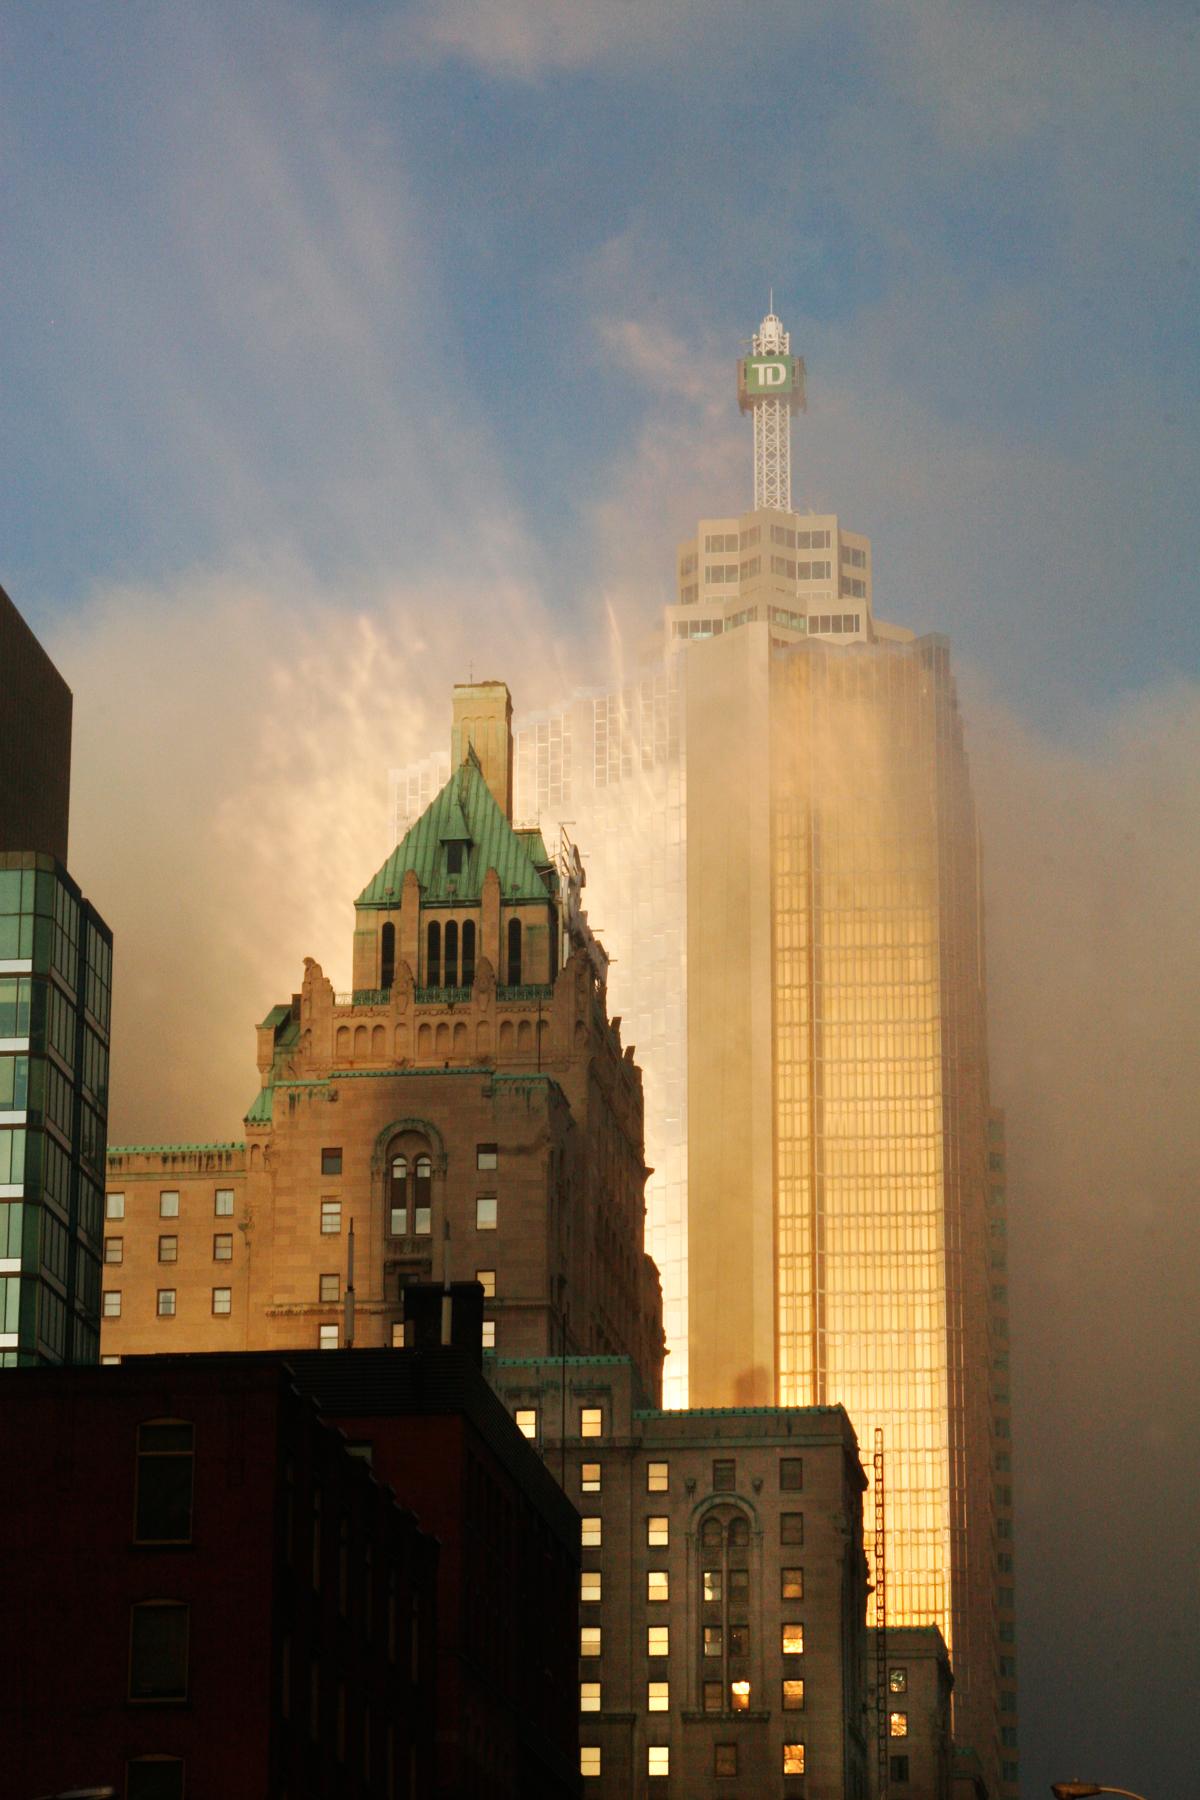 TD building, Toronto